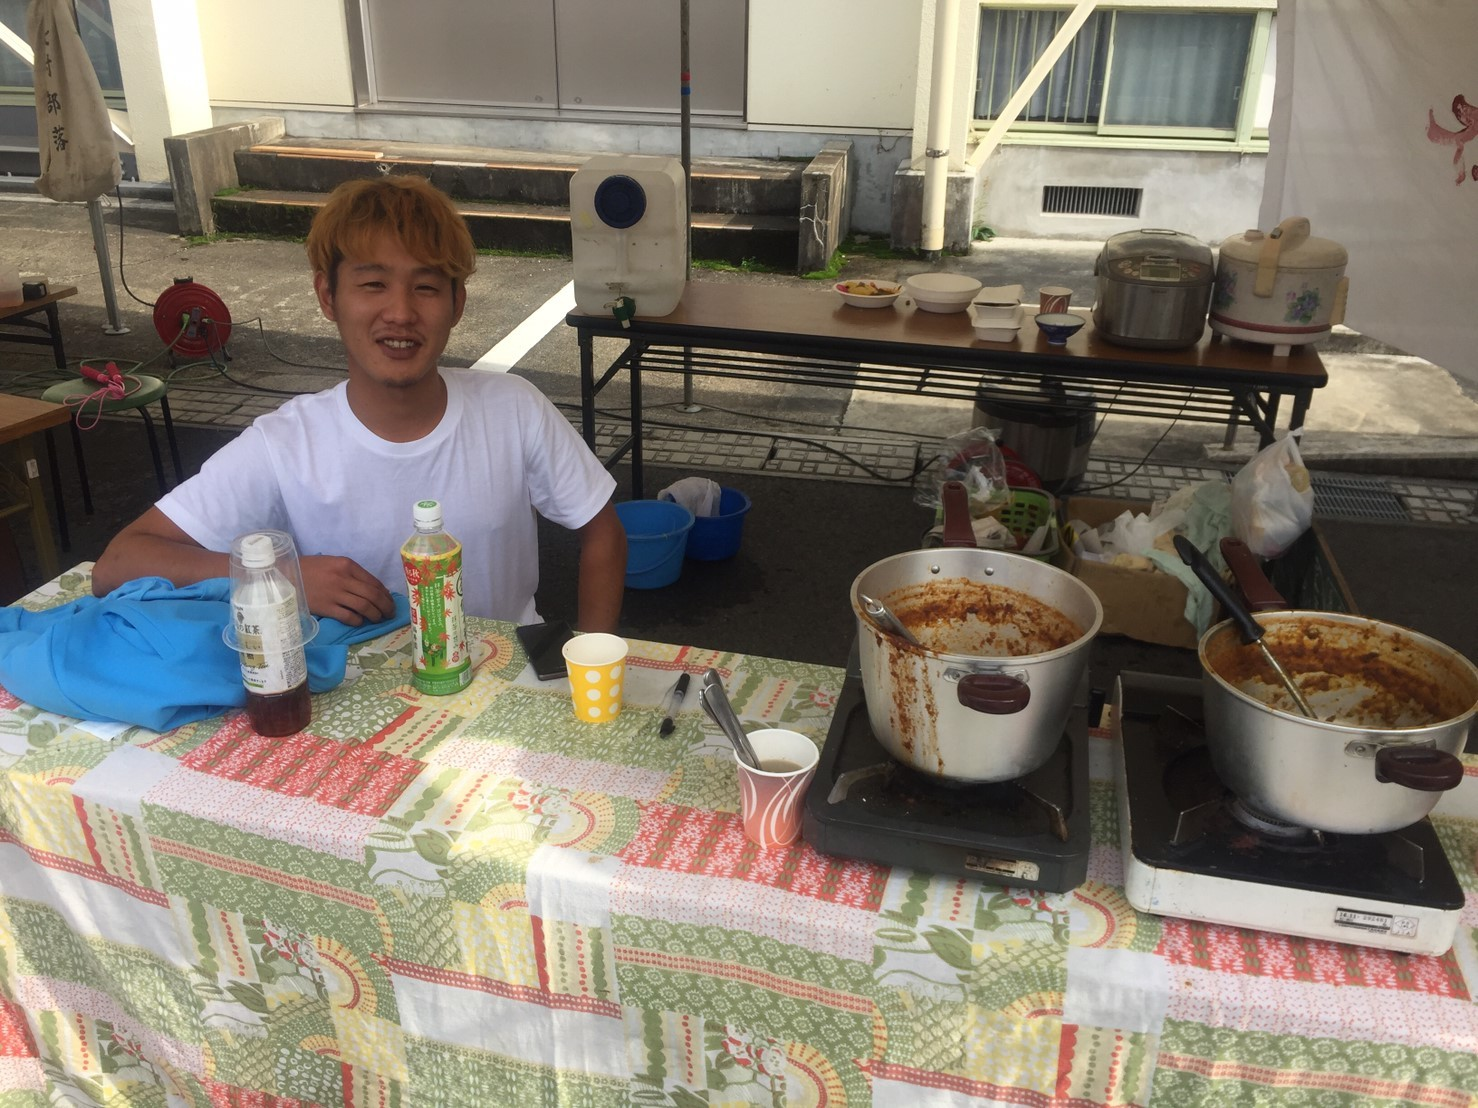 西郷工芸祭り・三滝渓_e0115904_15163015.jpg